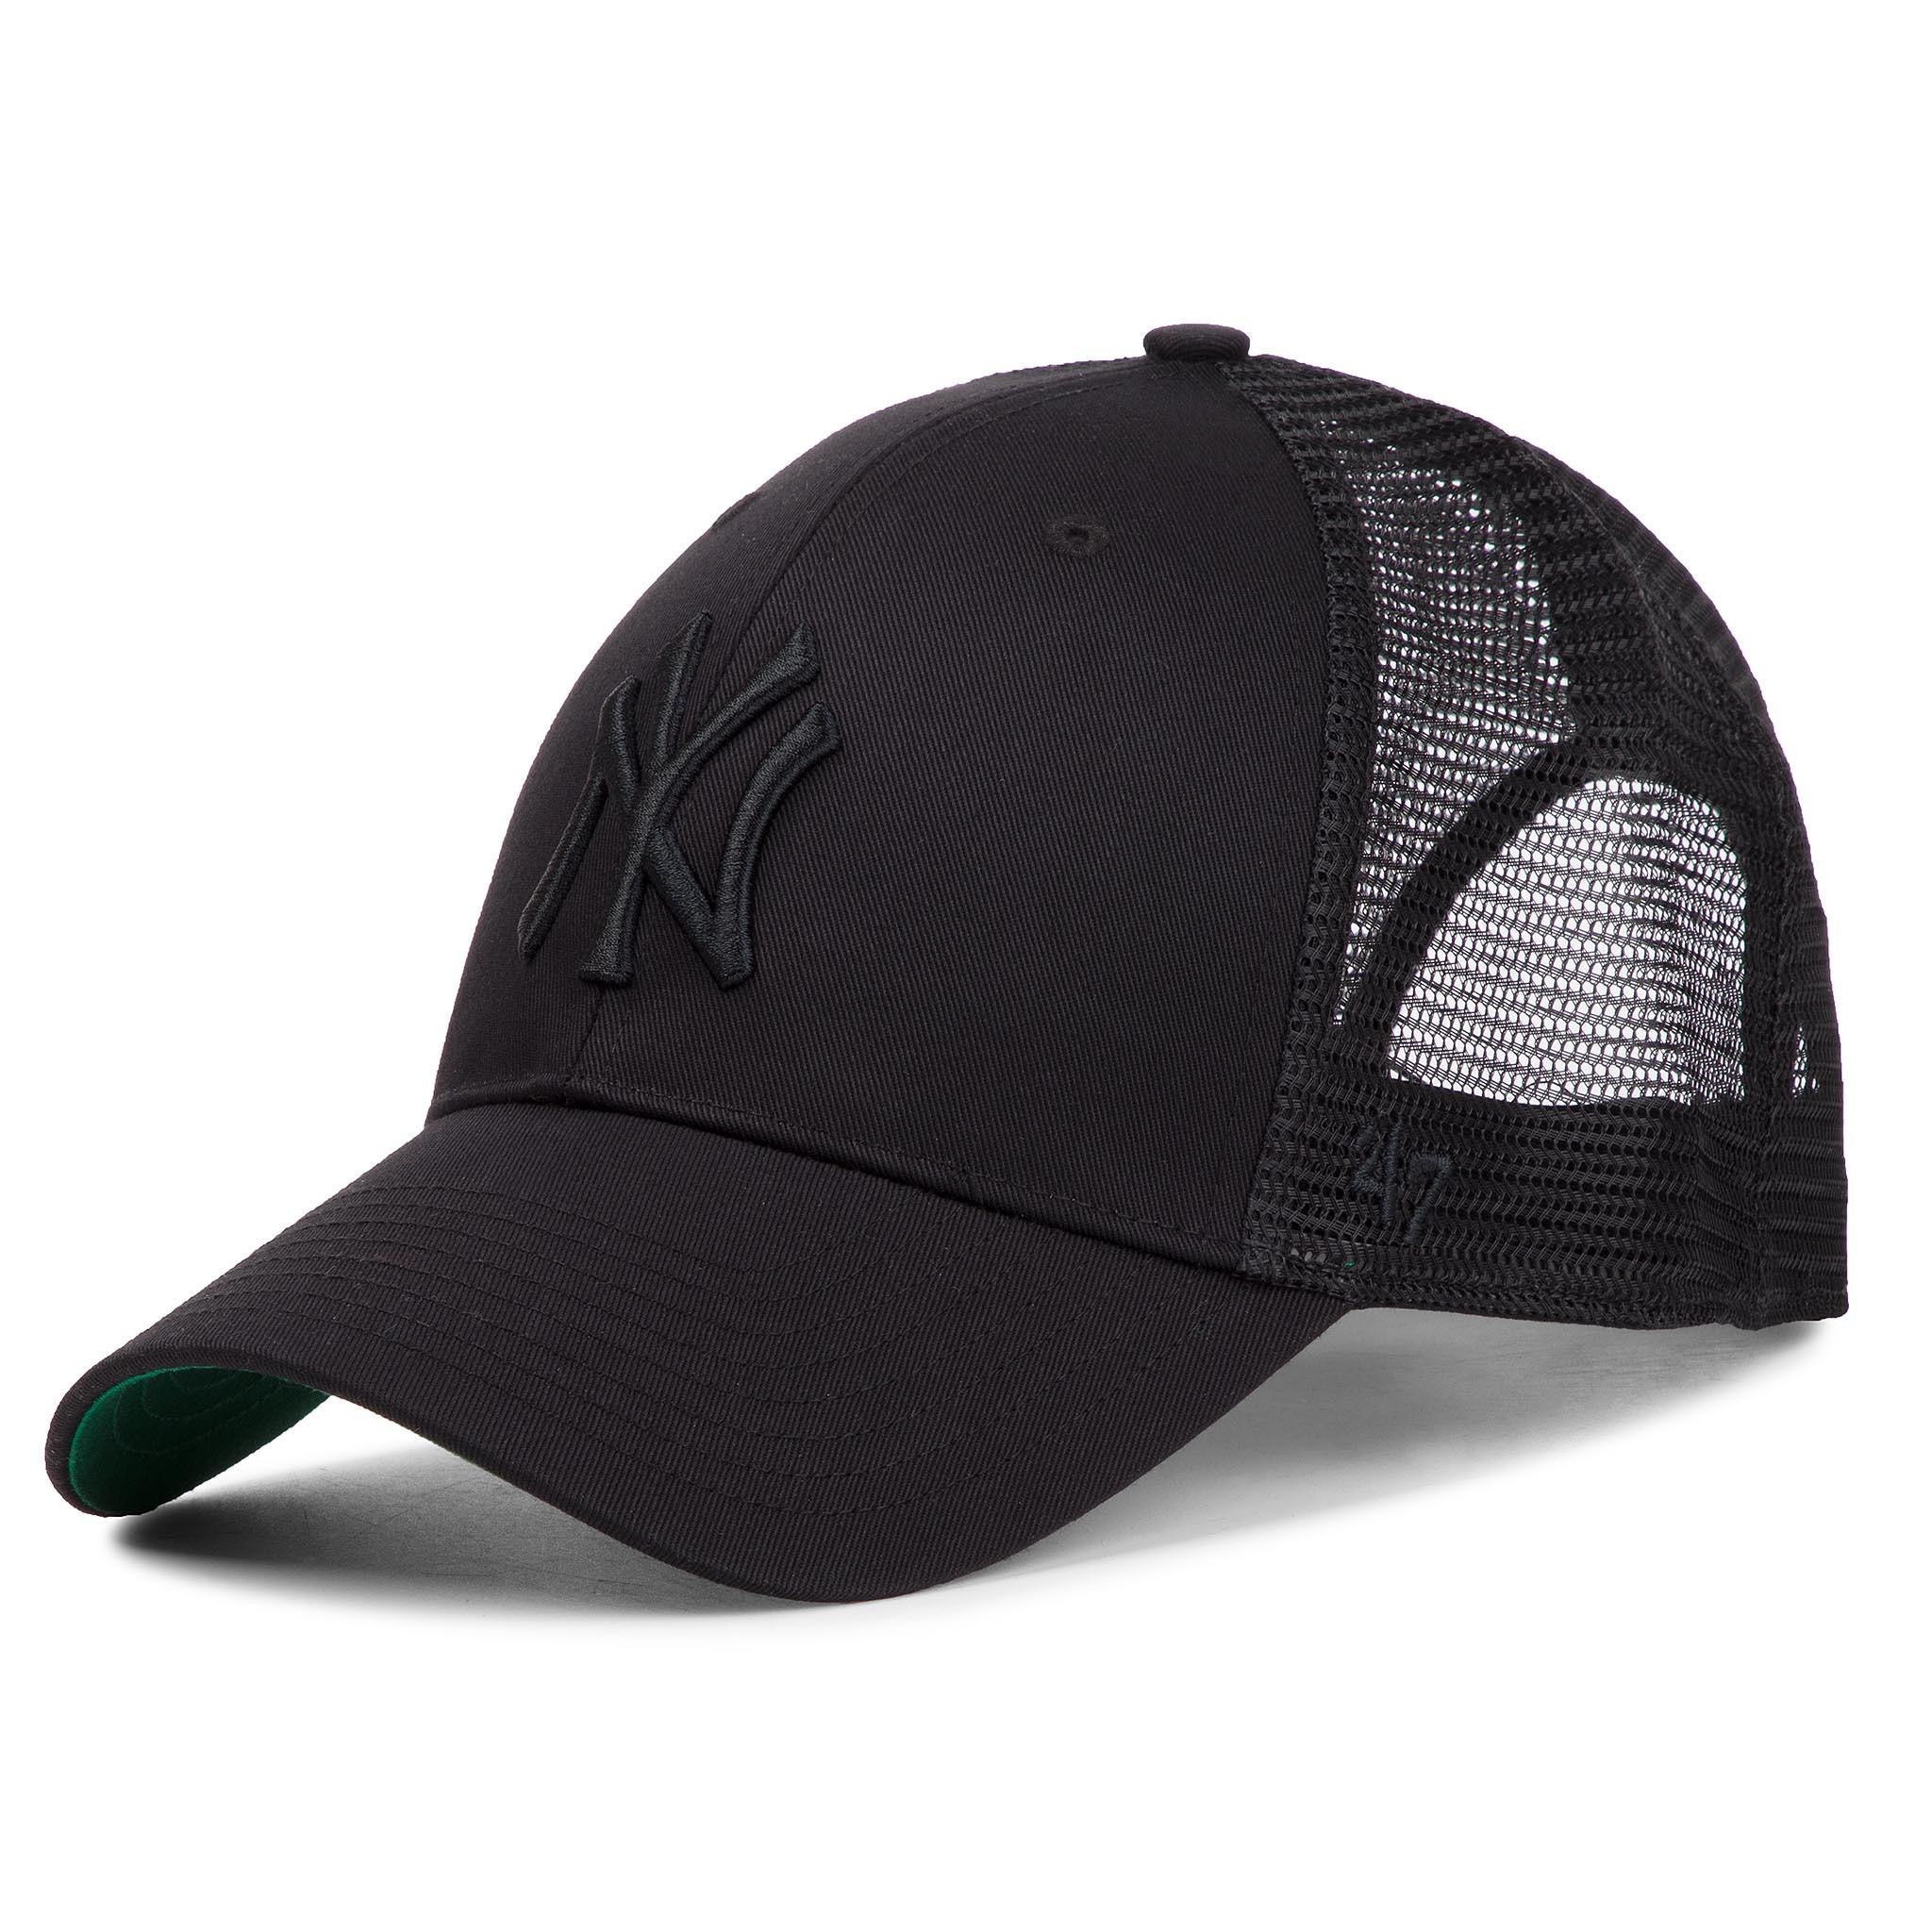 Kšiltovka 47 BRAND - New York Yankees B-BRANS17CTP-BKB Black